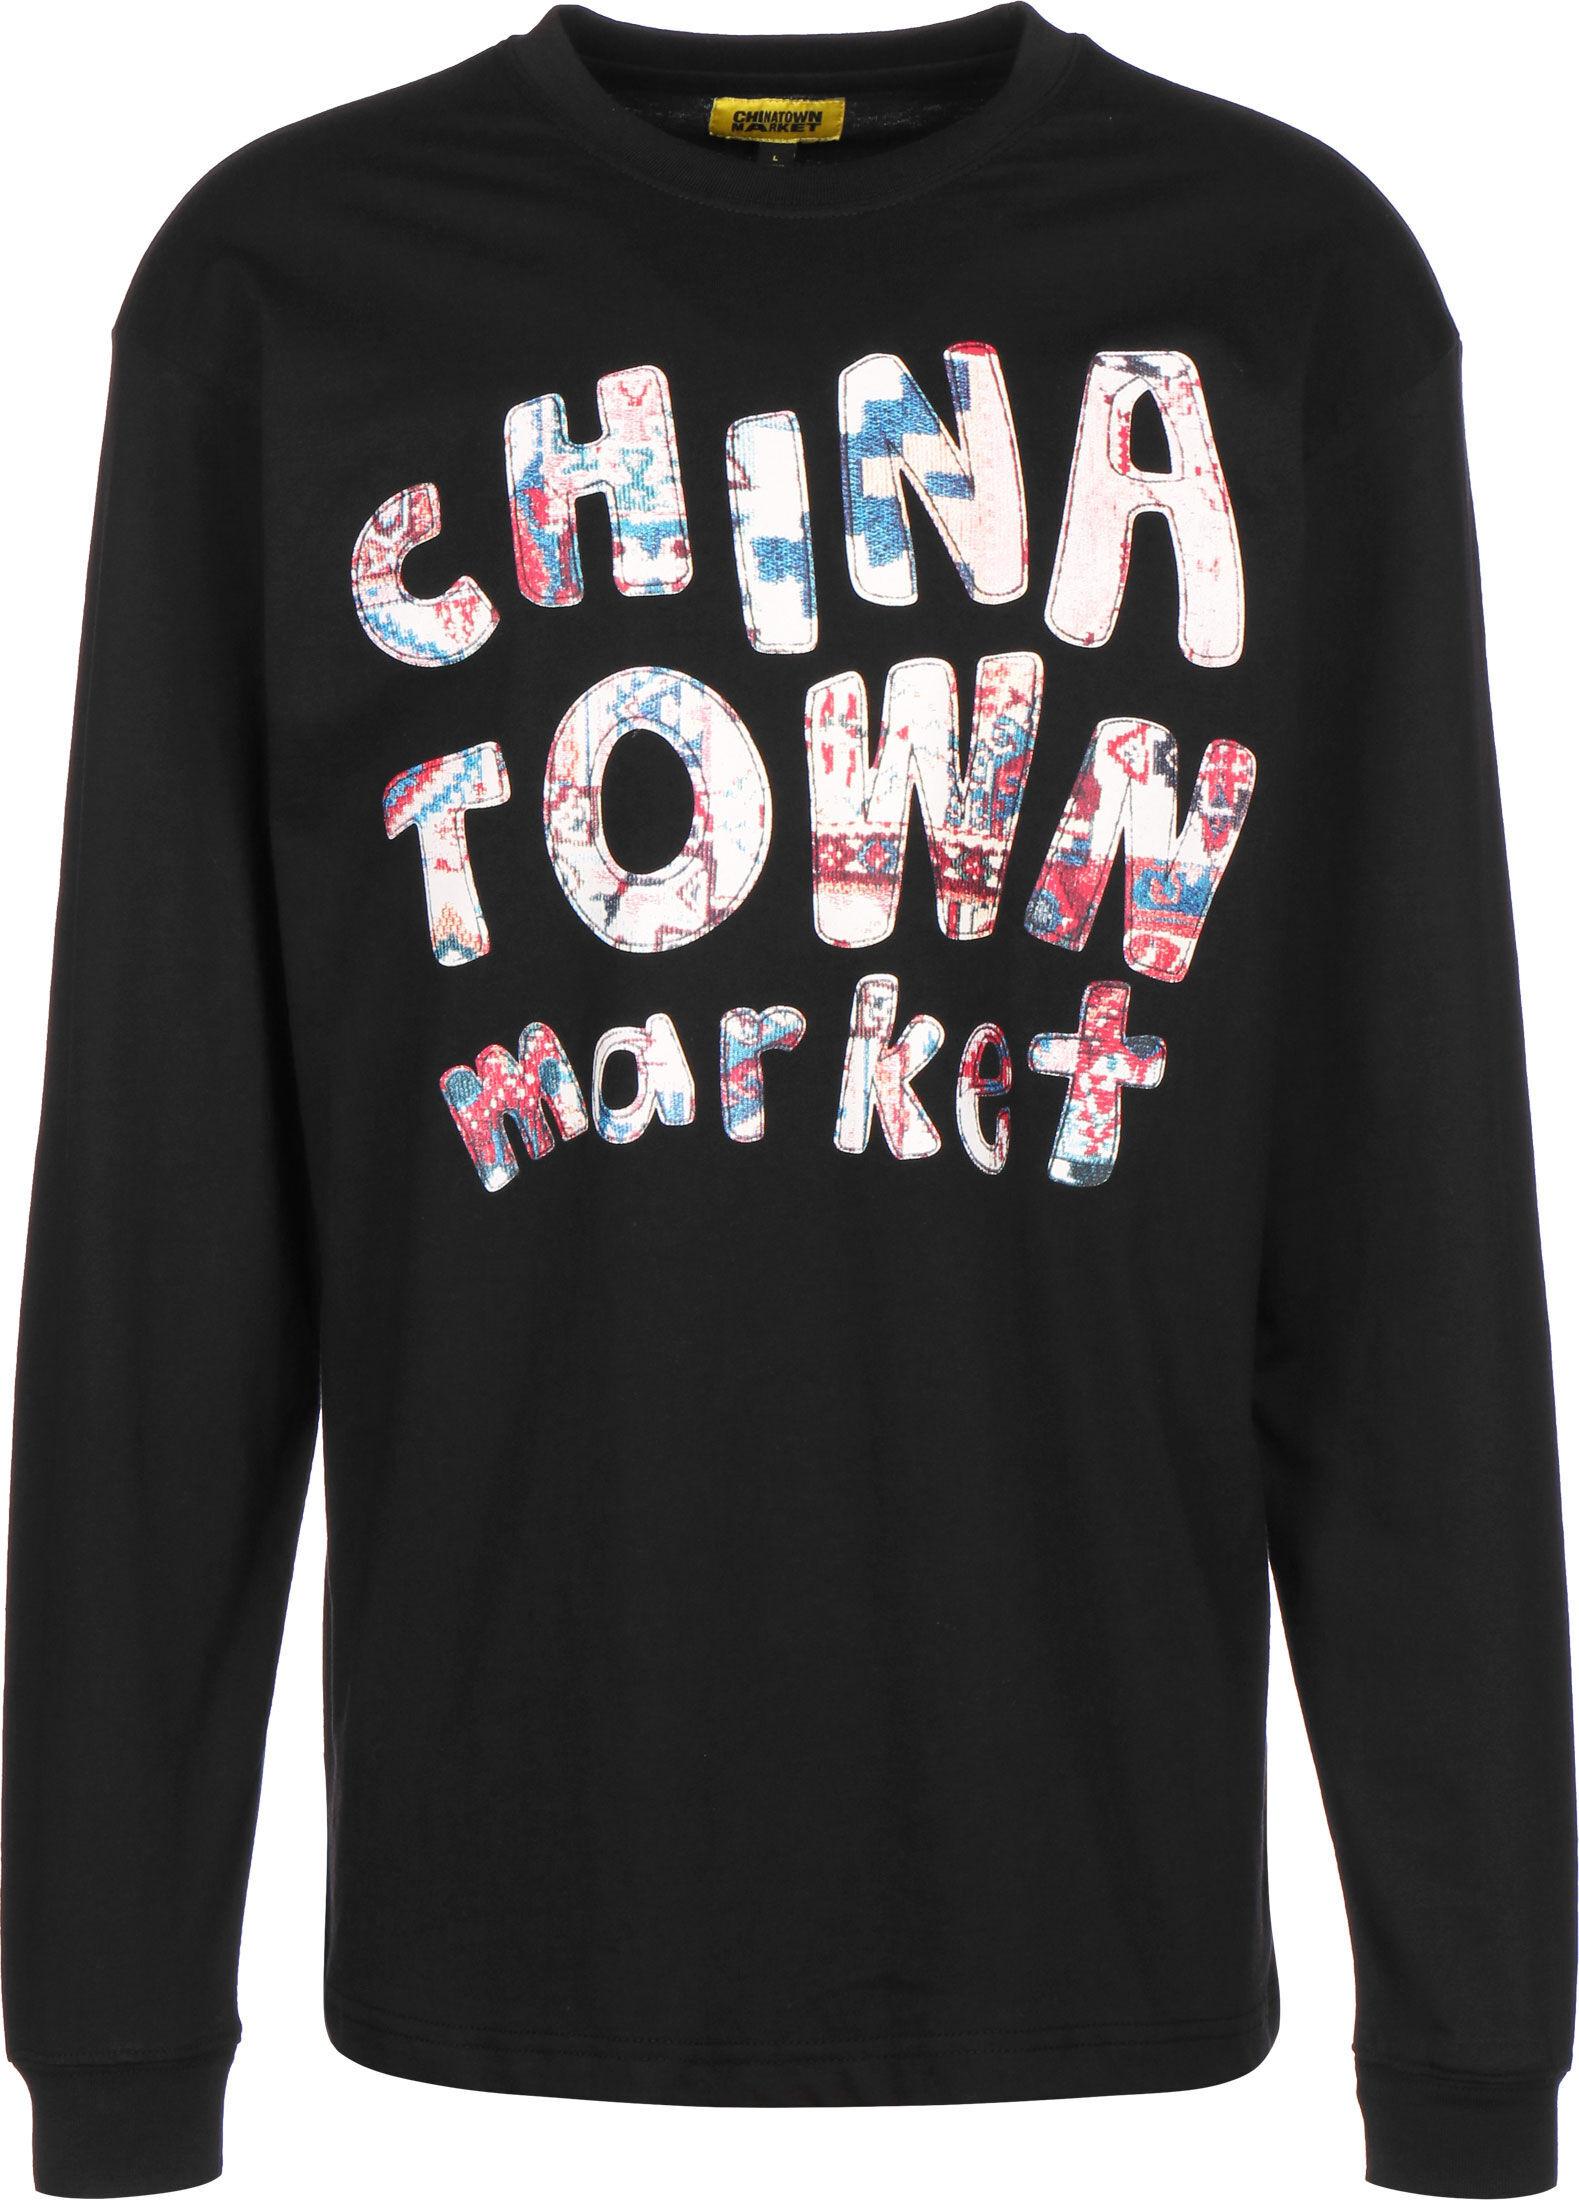 Chinatown Market Rug Dealer, taille S, homme, noir